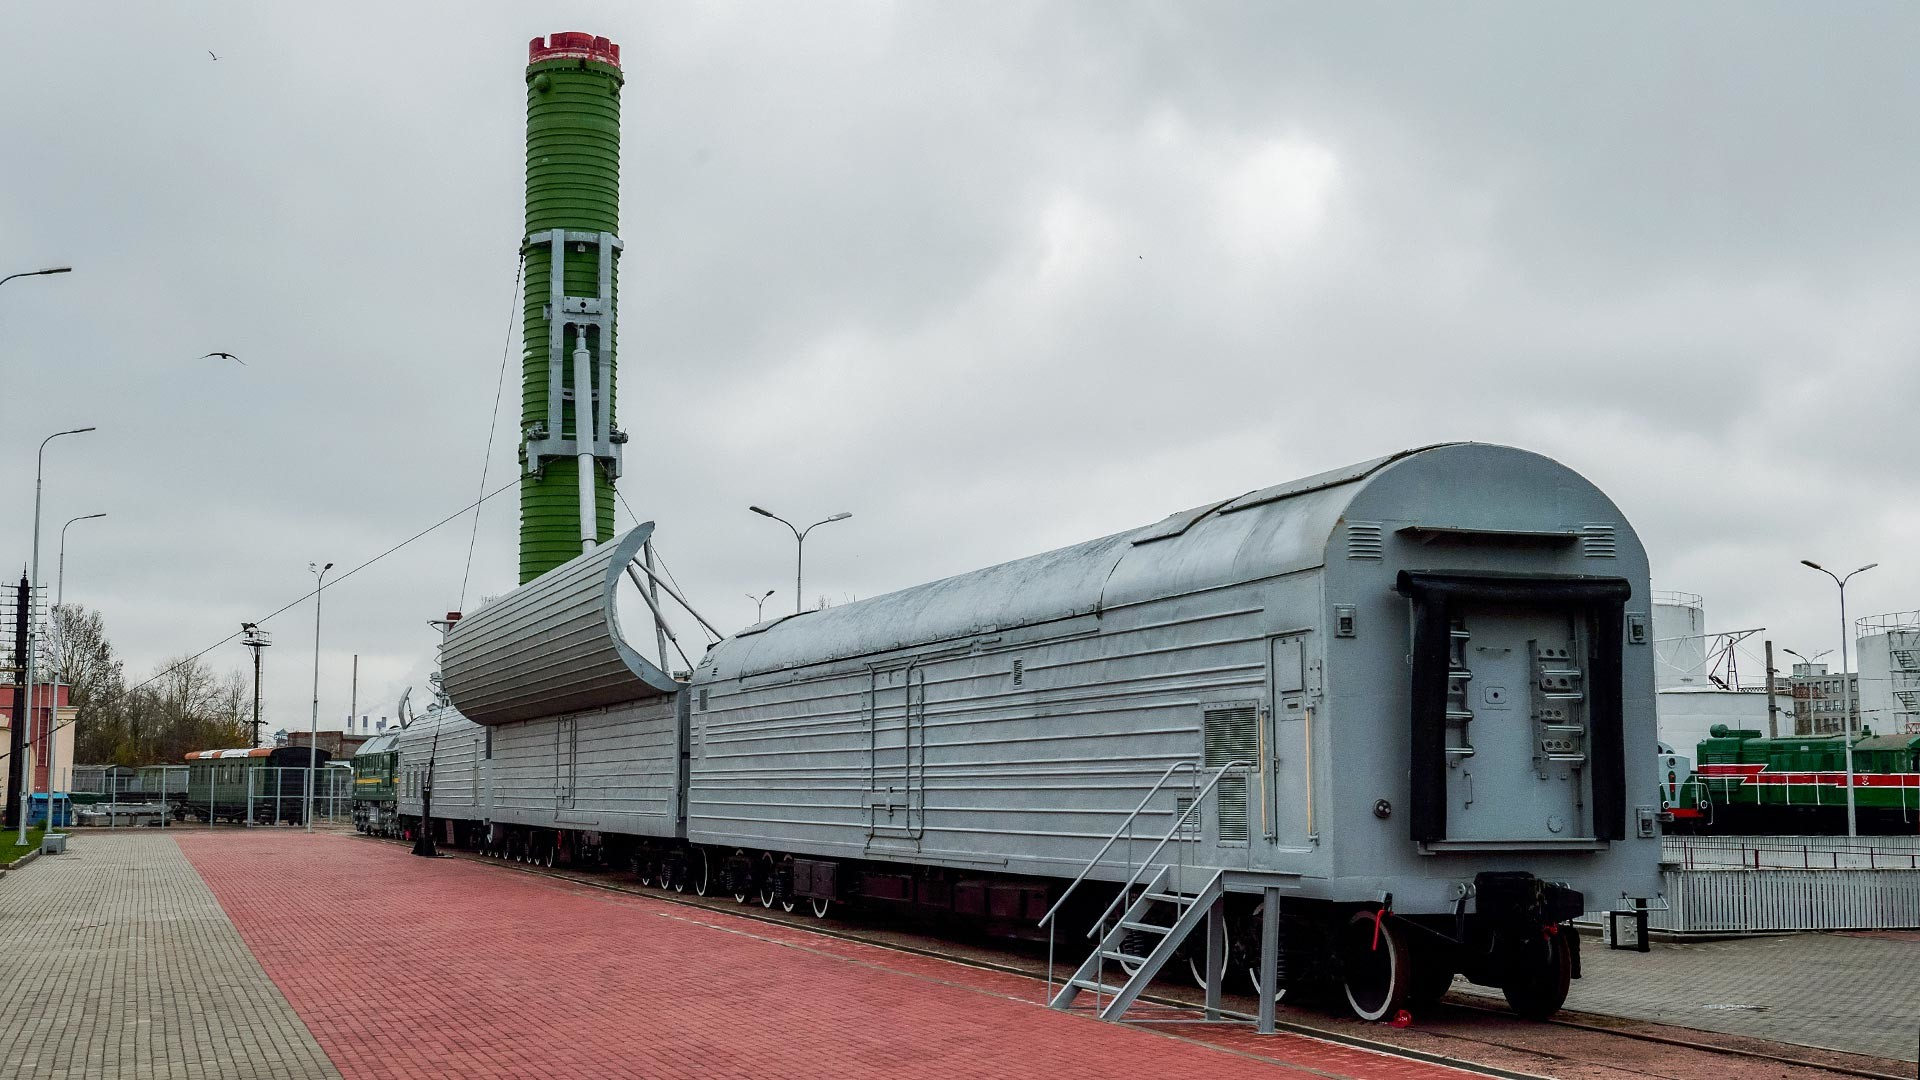 Sistem rudal kereta api tempur BZHRK Molodets (pendahulu Barguzin) ditampilkan pada pameran di Museum Kereta Api Rusia, Sankt Peterburg.